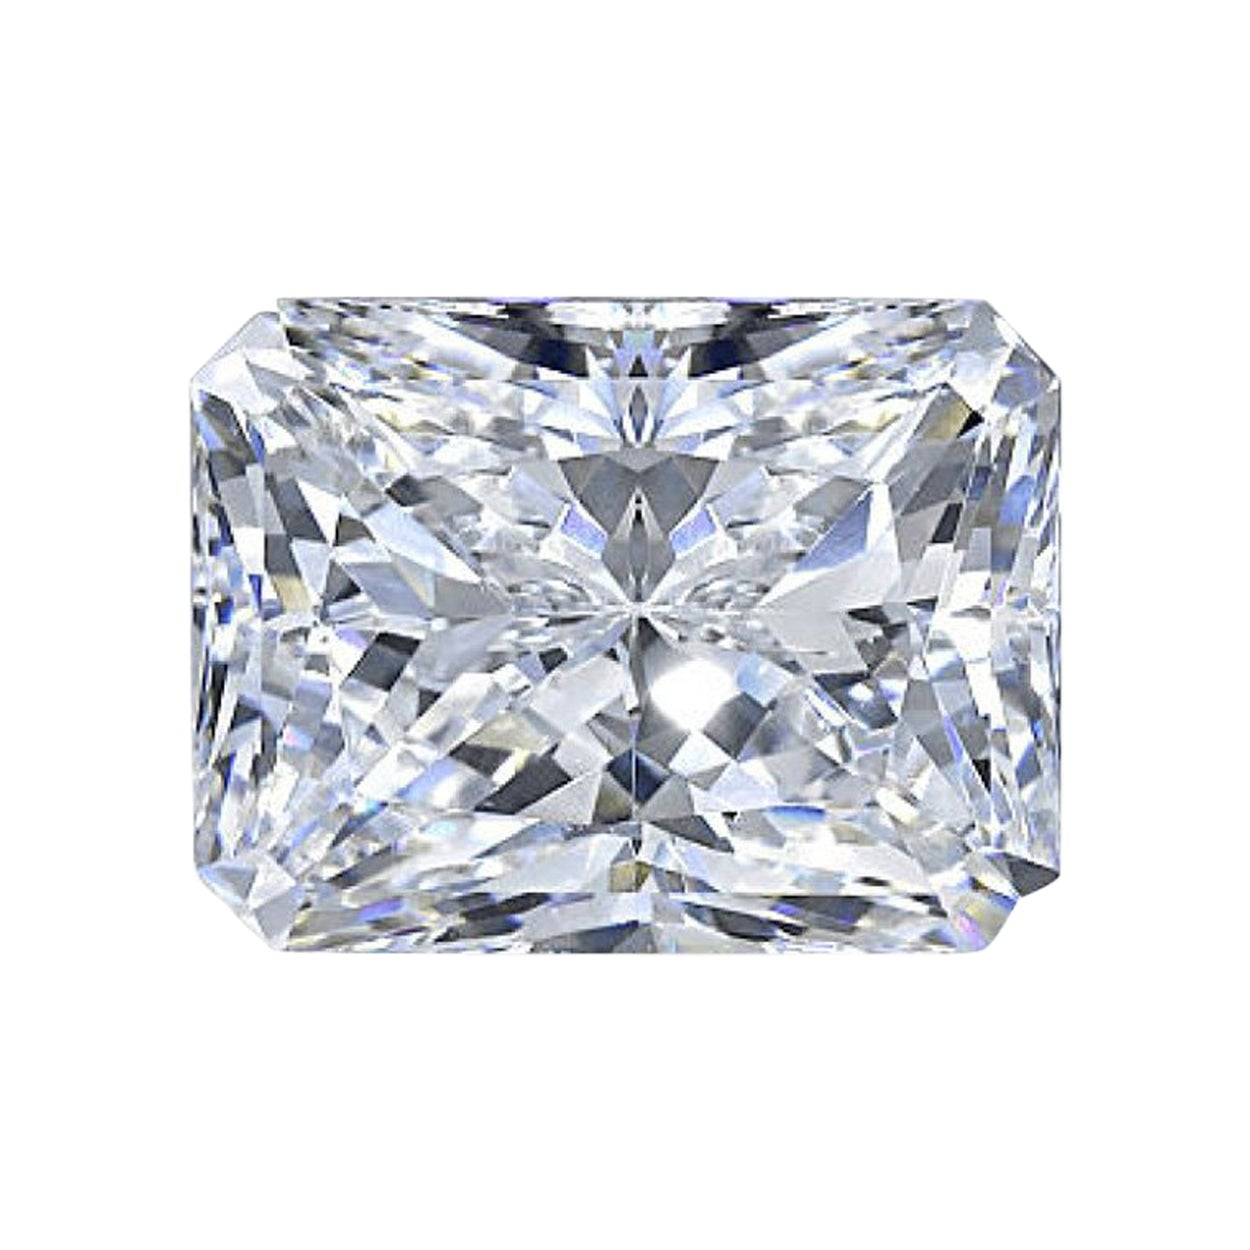 GIA Certified Radiant Cut Diamond 5.05 Carat F/VS2